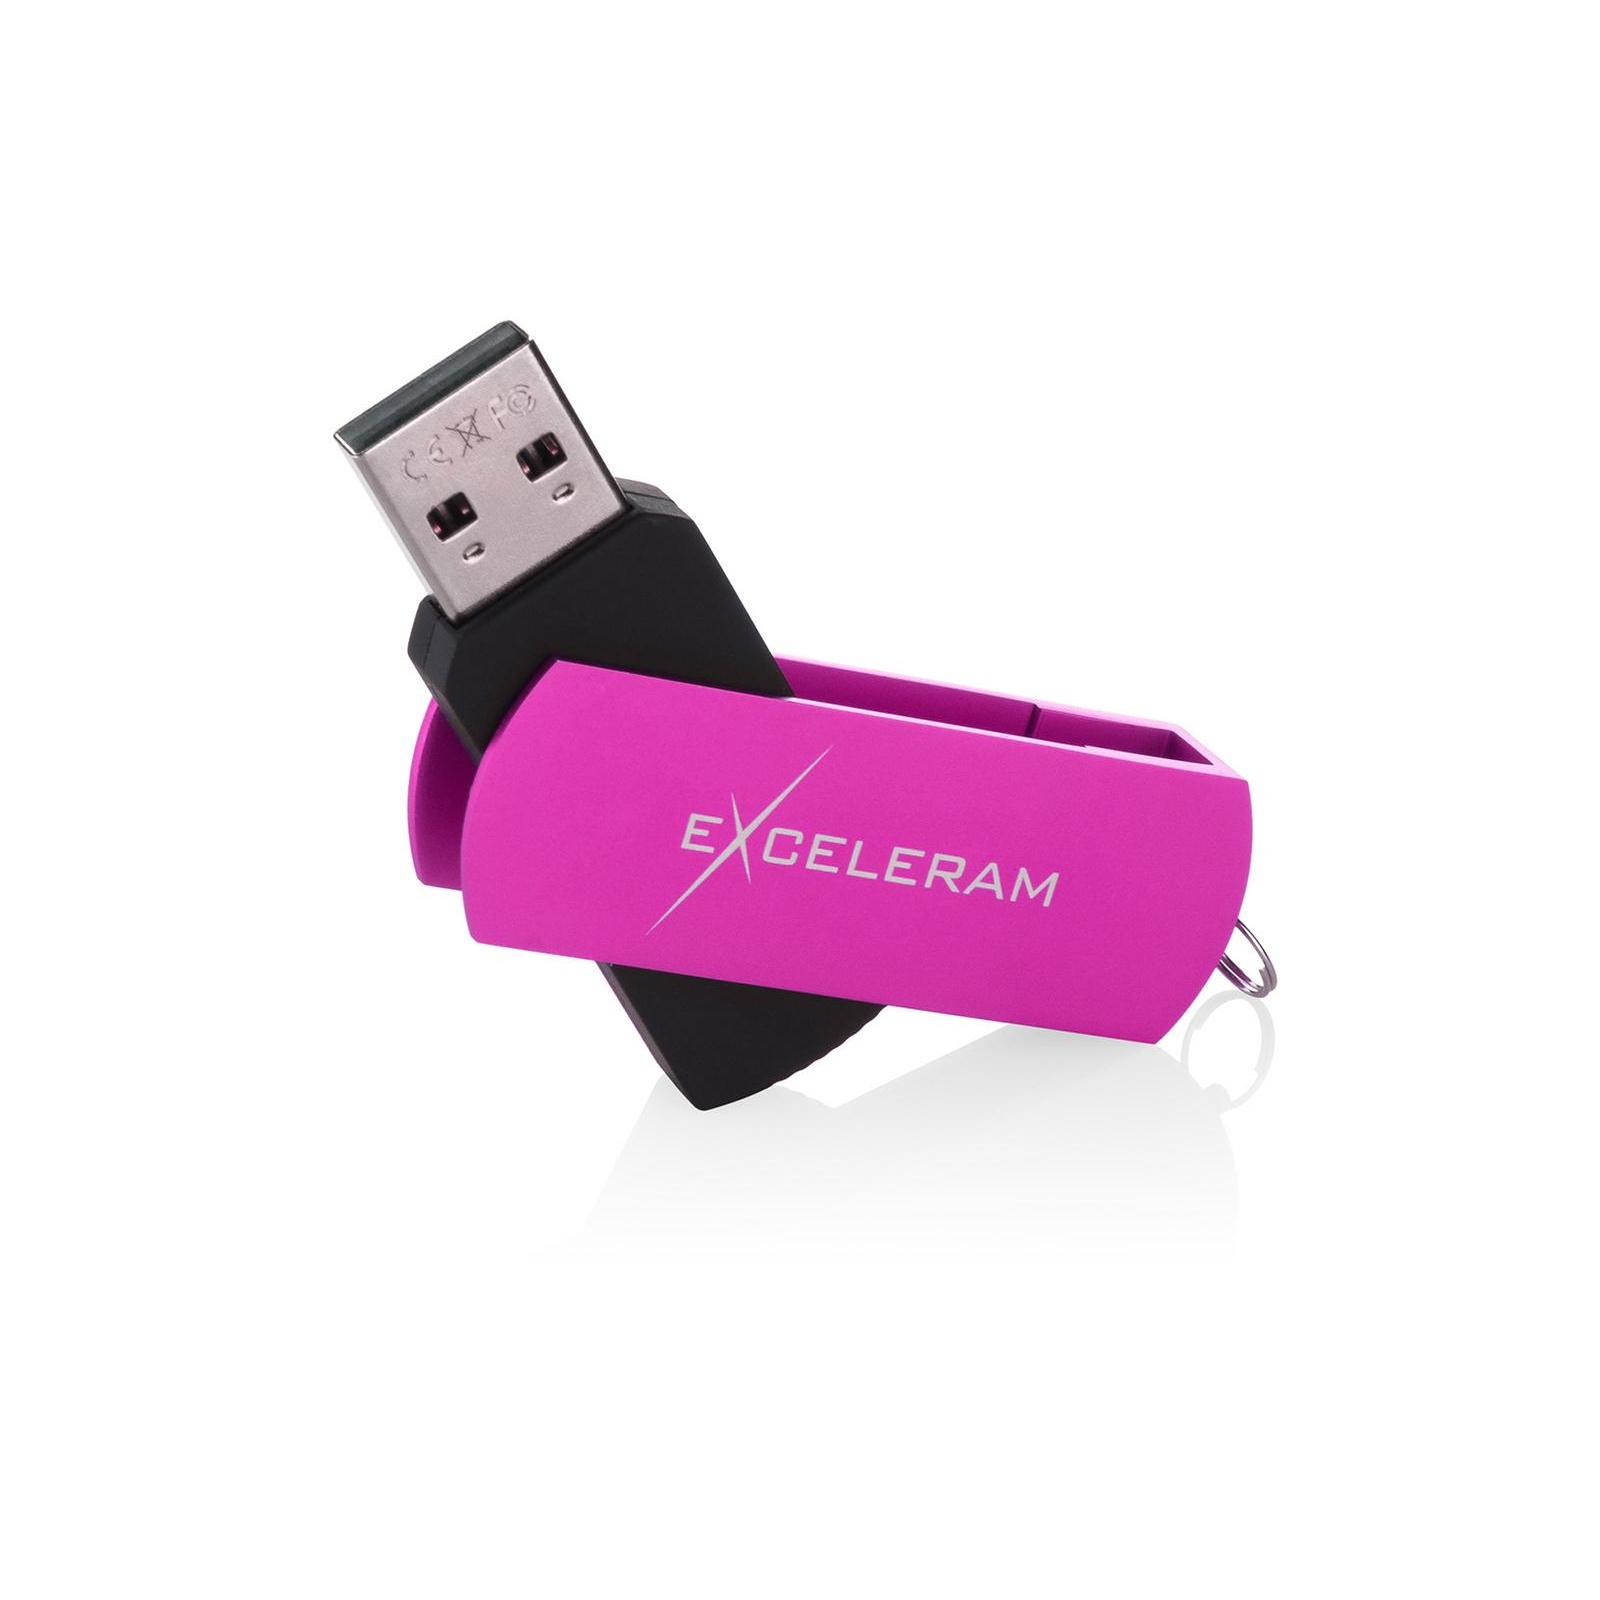 USB флеш накопитель eXceleram 64GB P2 Series Yellow2/Black USB 2.0 (EXP2U2Y2B64) изображение 3